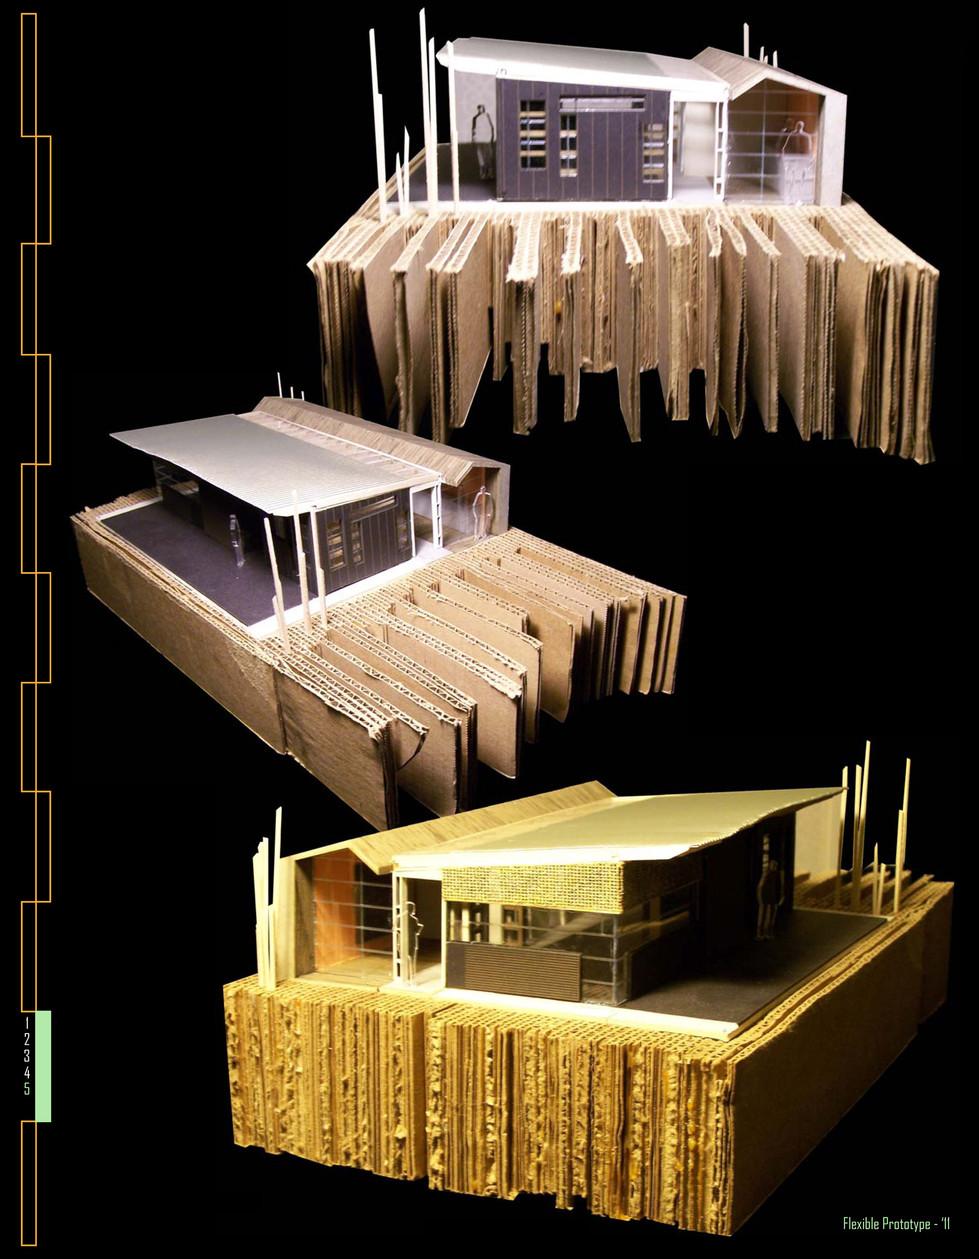 Habitat For Humanity Prototype